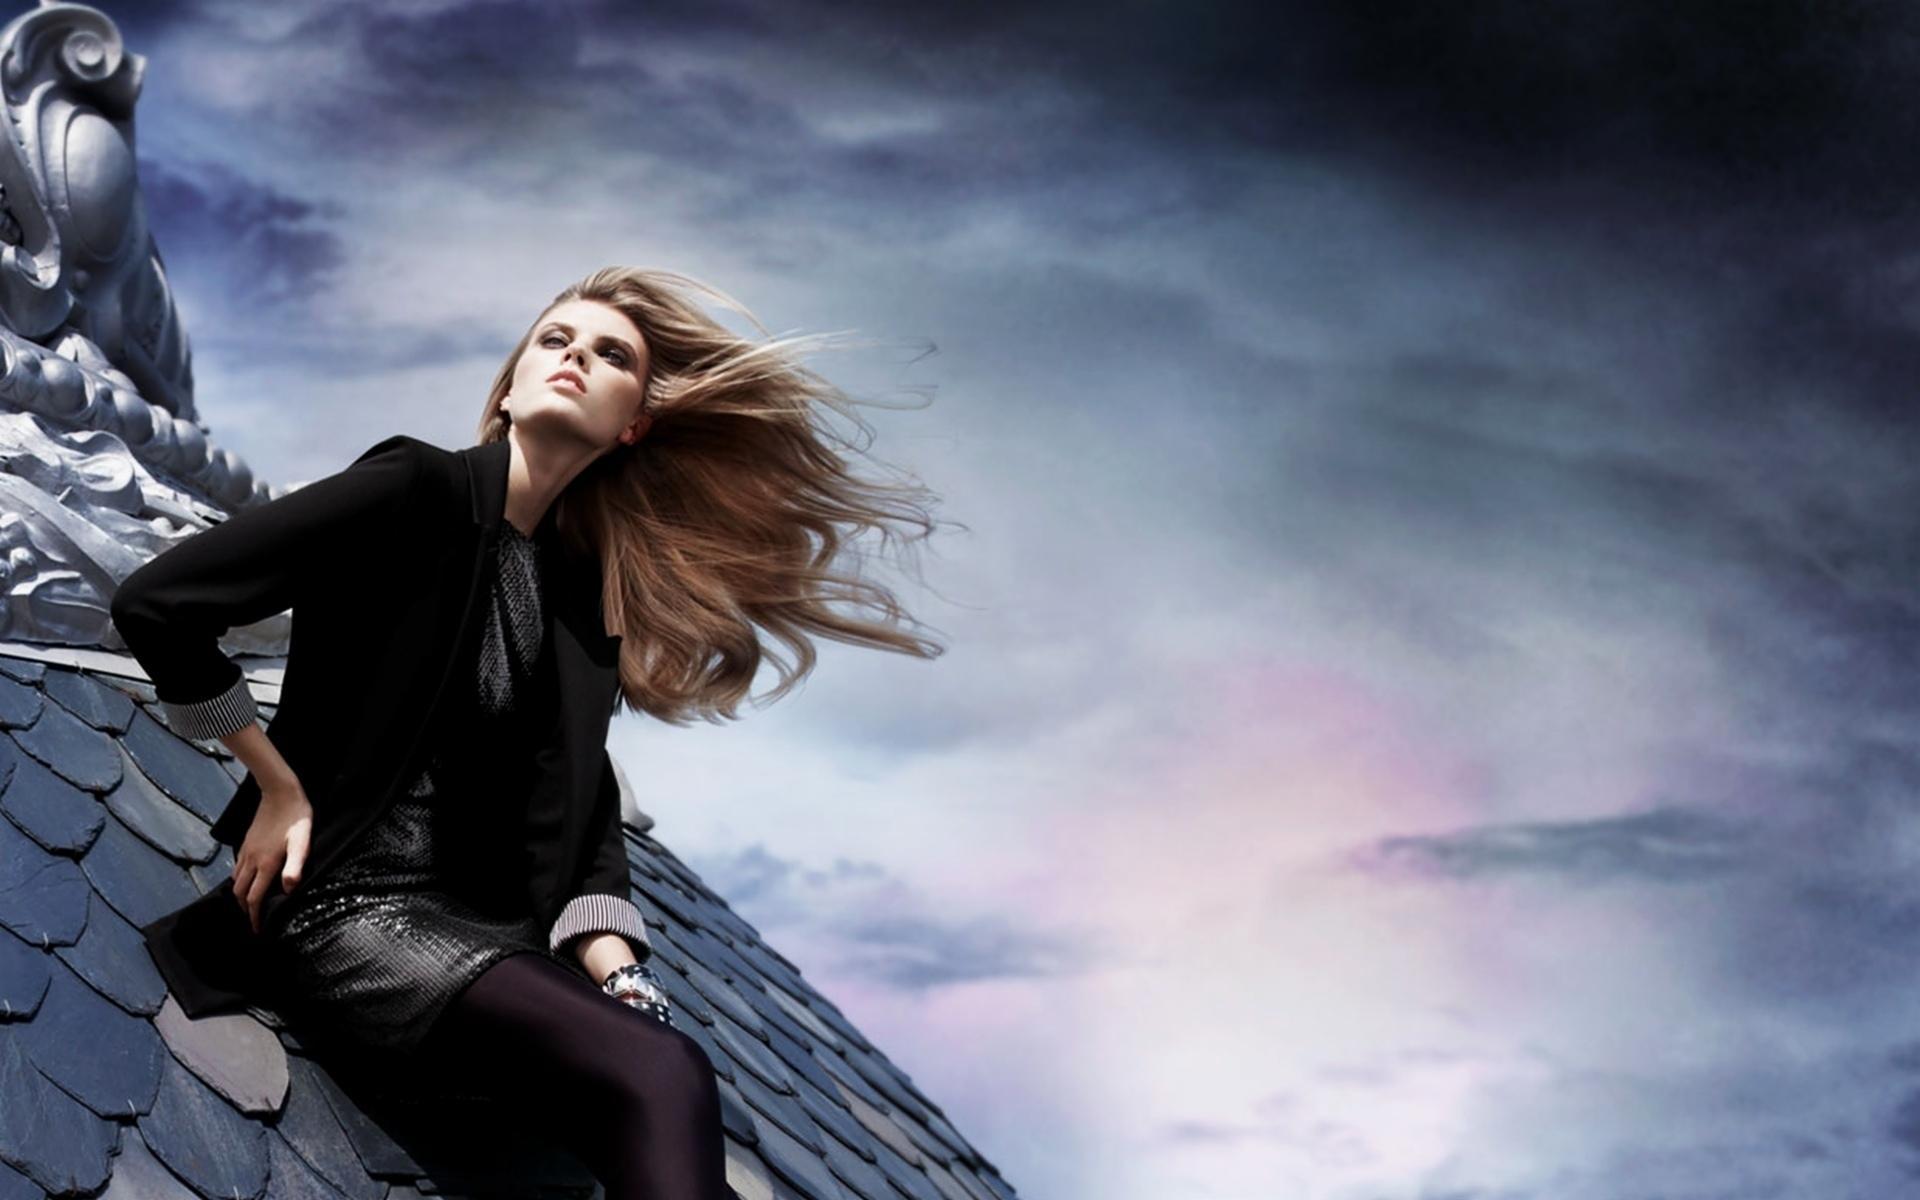 Toni Garrn Wallpaper HD Download